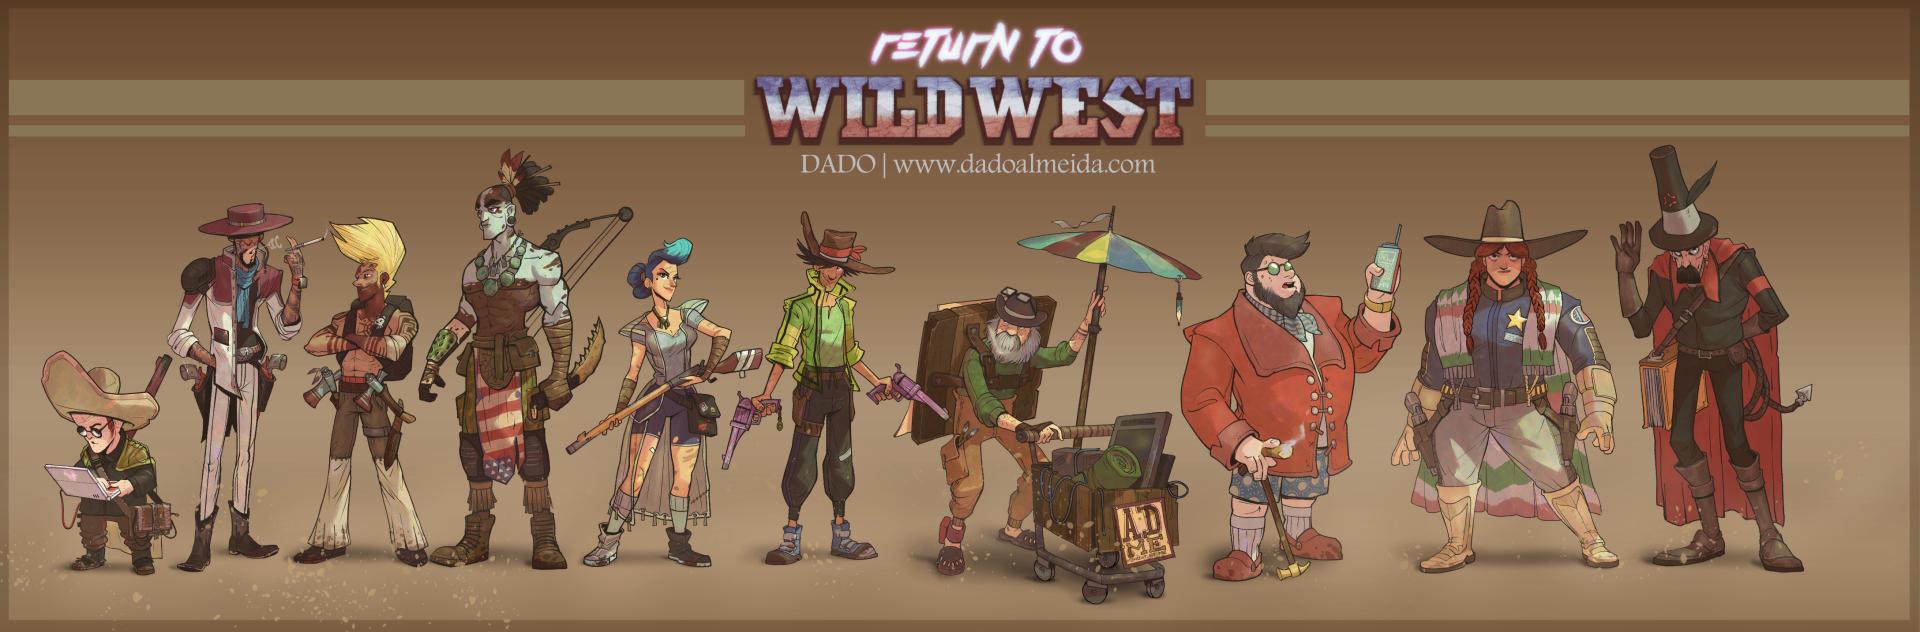 Return to Wild West (Concept Idea)